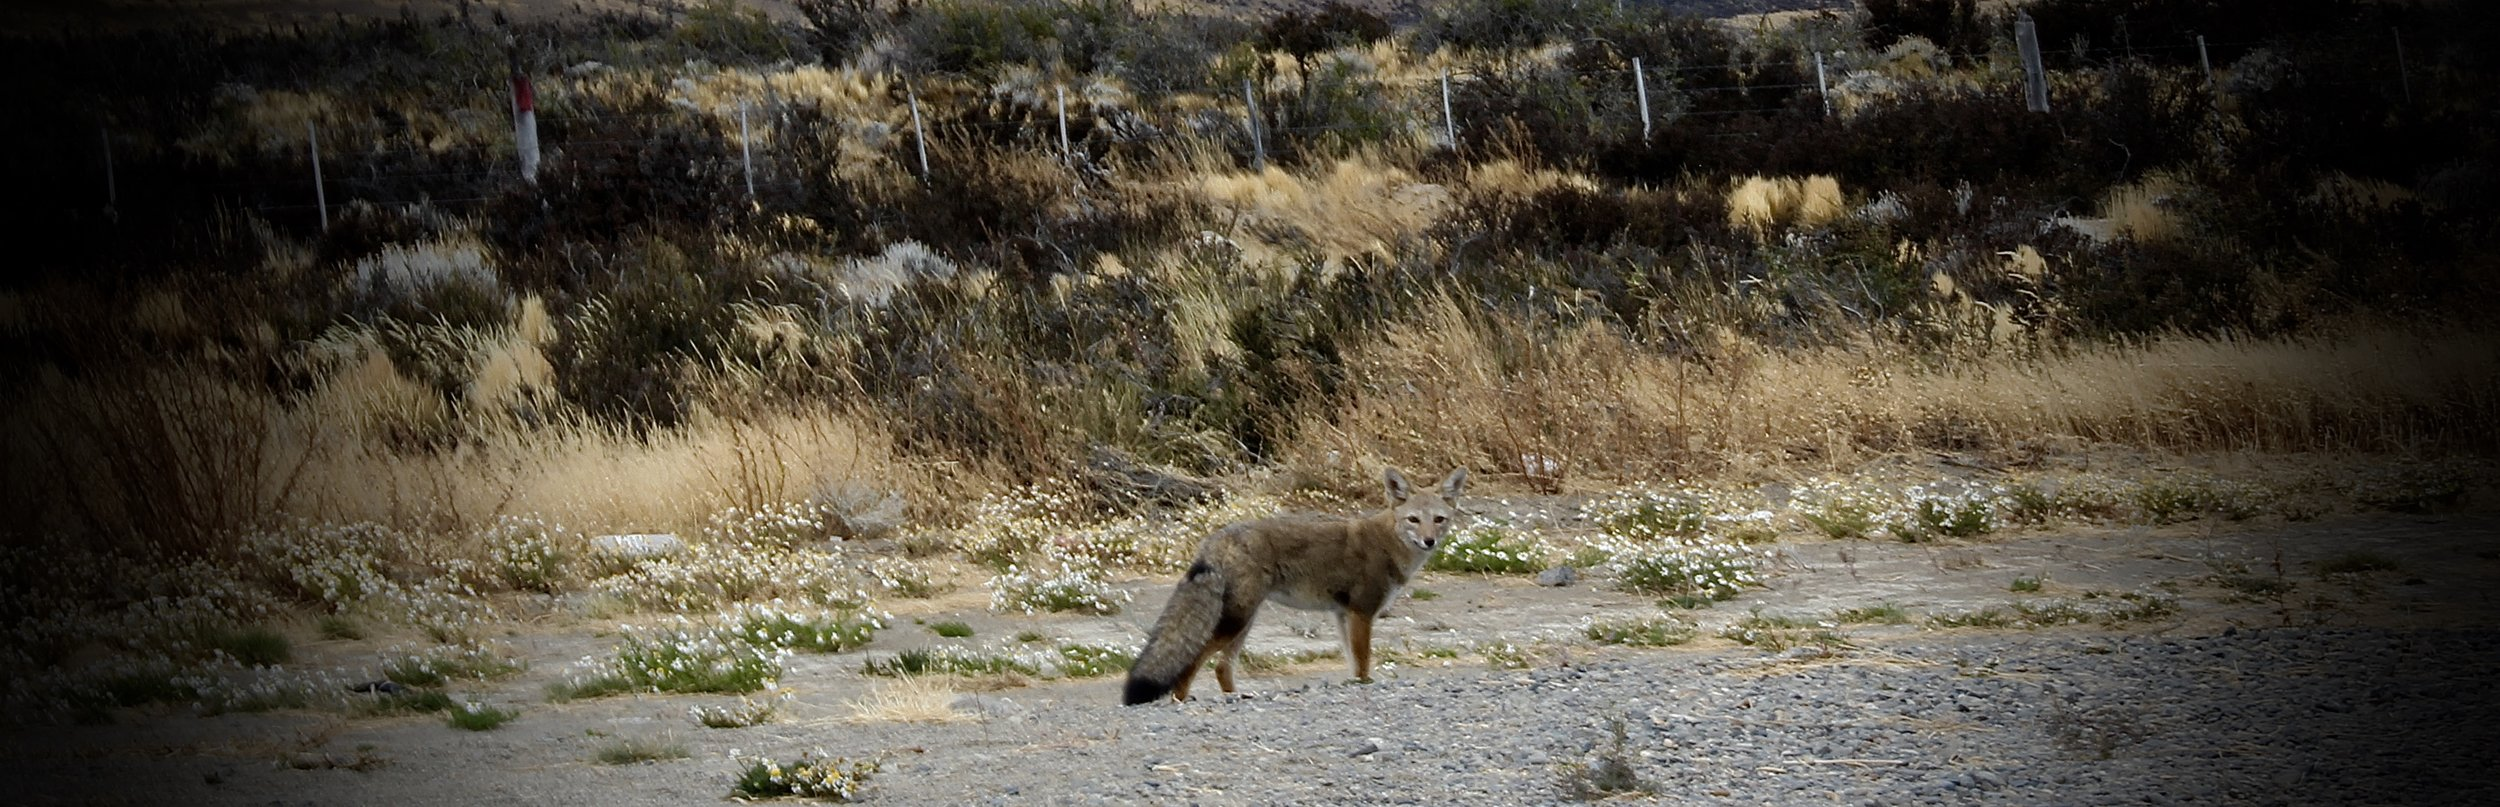 South American Grey Fox / Patagonian Fox / Culpeo / Chilla / Grey Zorro.